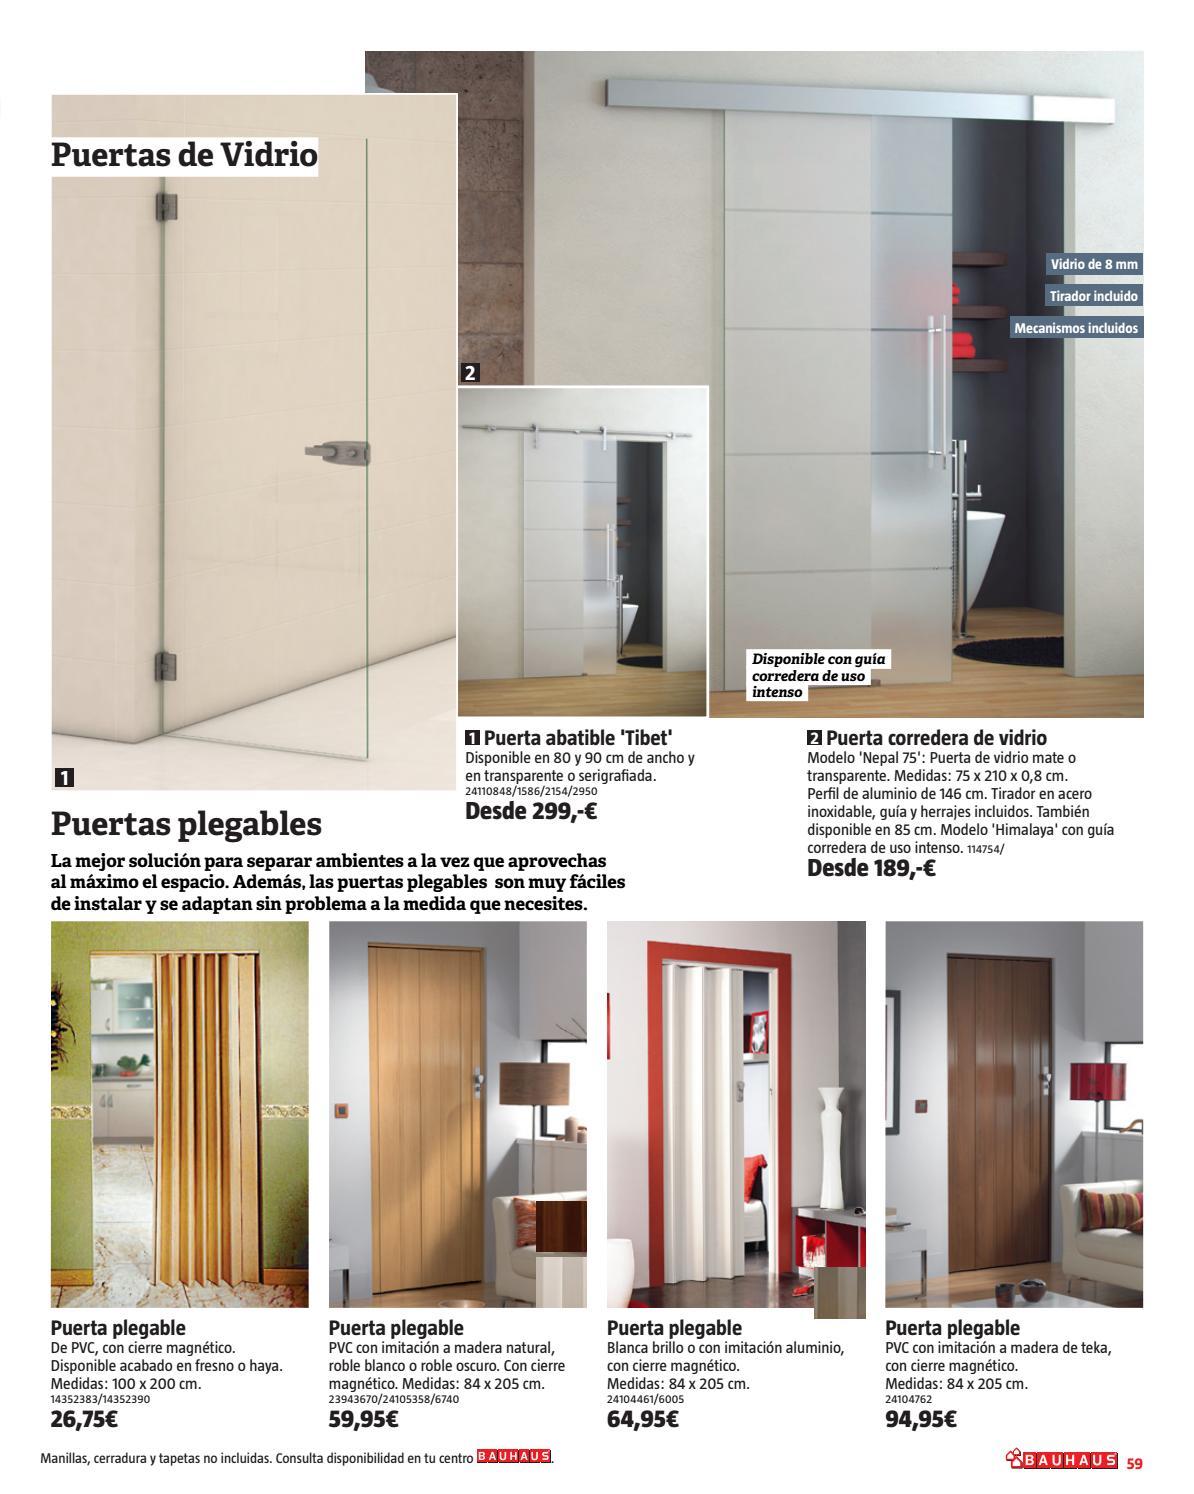 Especial decoraci n by bauhaus issuu - Puerta corredera plegable ...